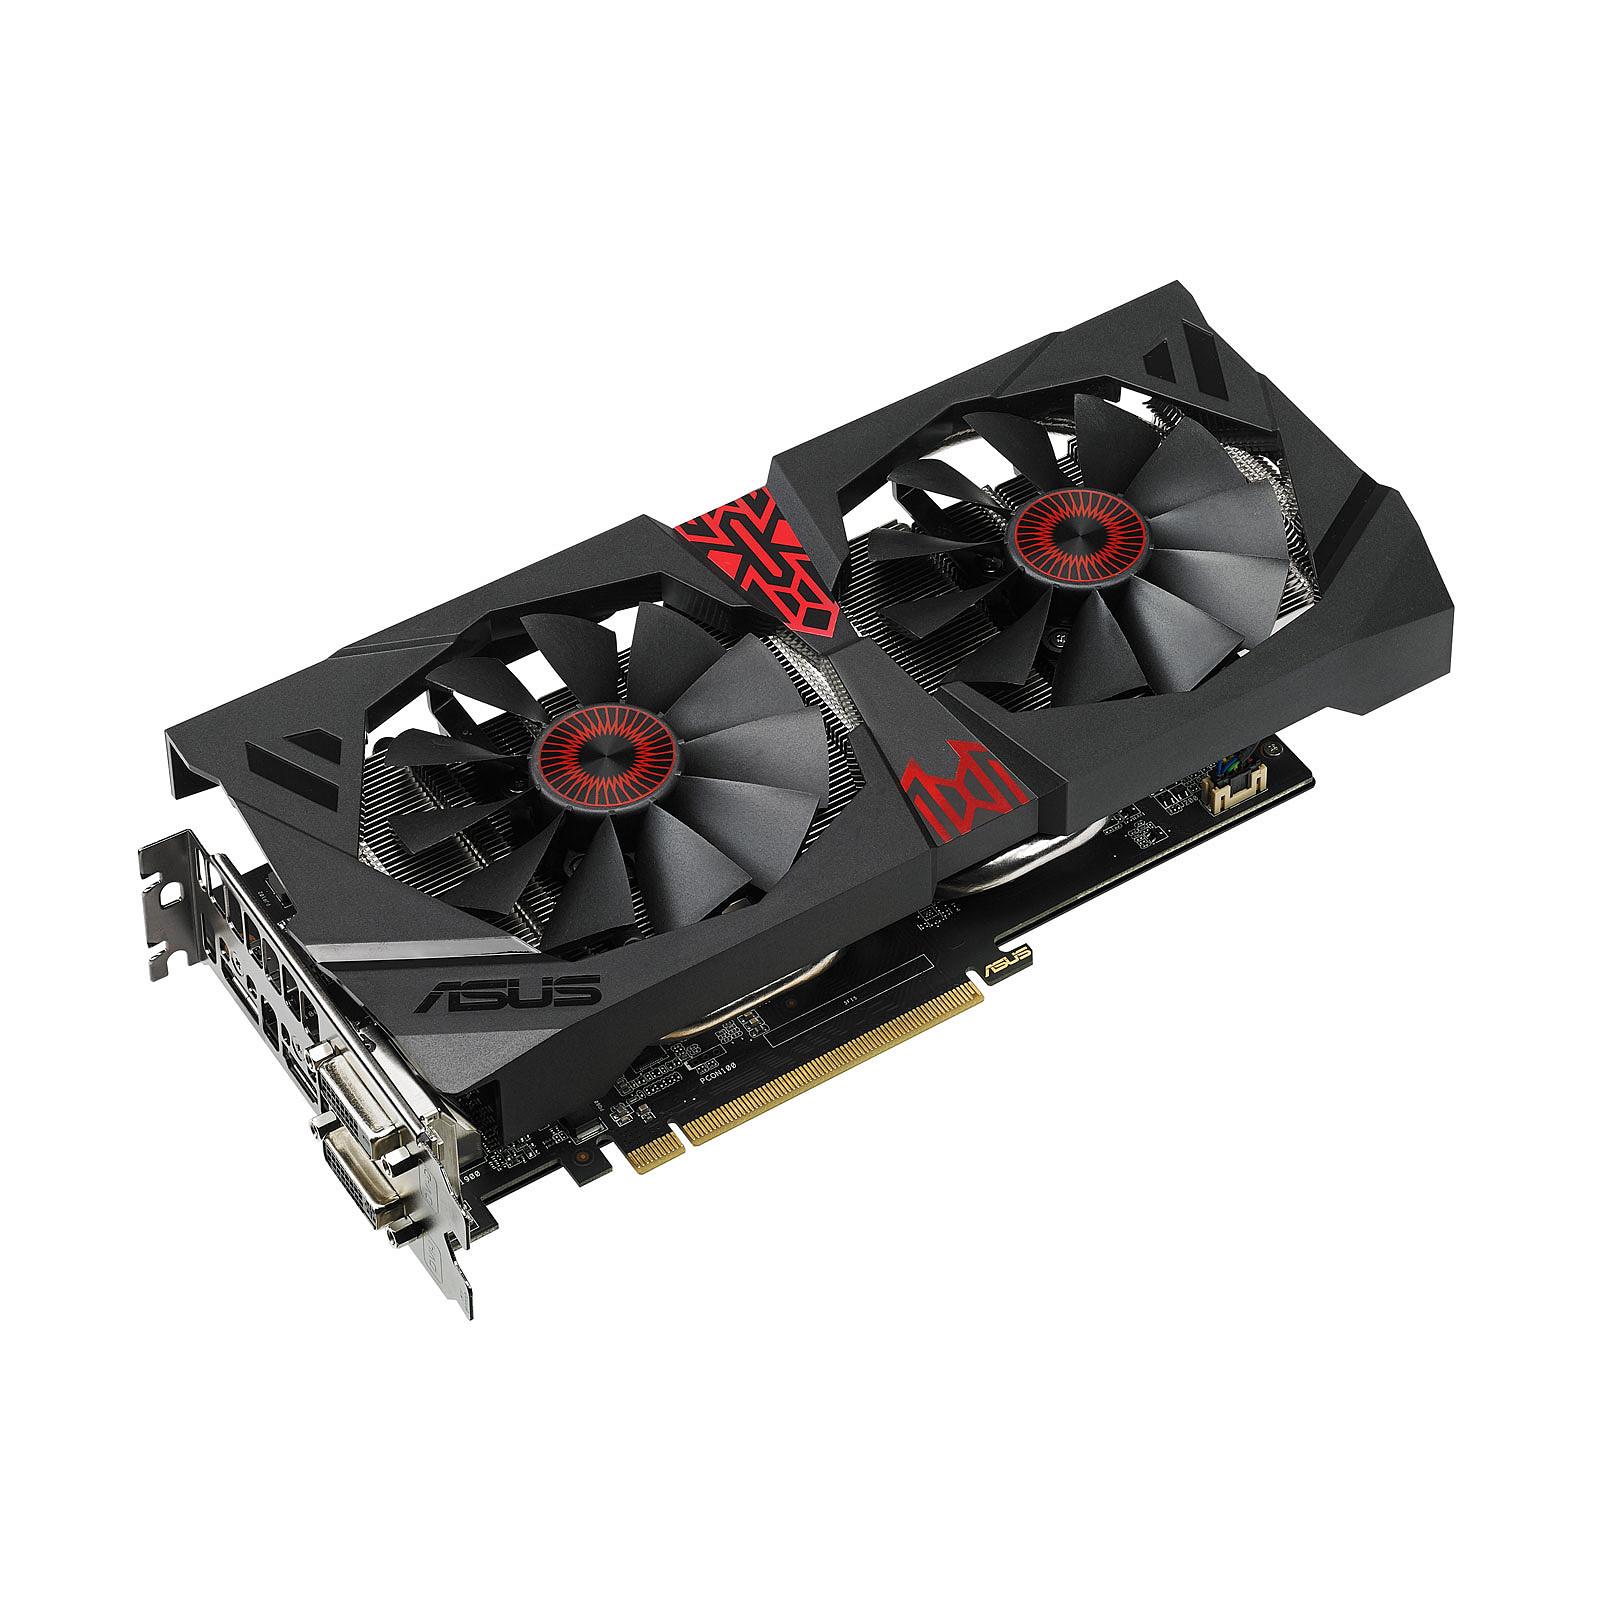 ASUS Radeon R9 380 STRIX-R9380-DC2OC-2GD5-GAMING